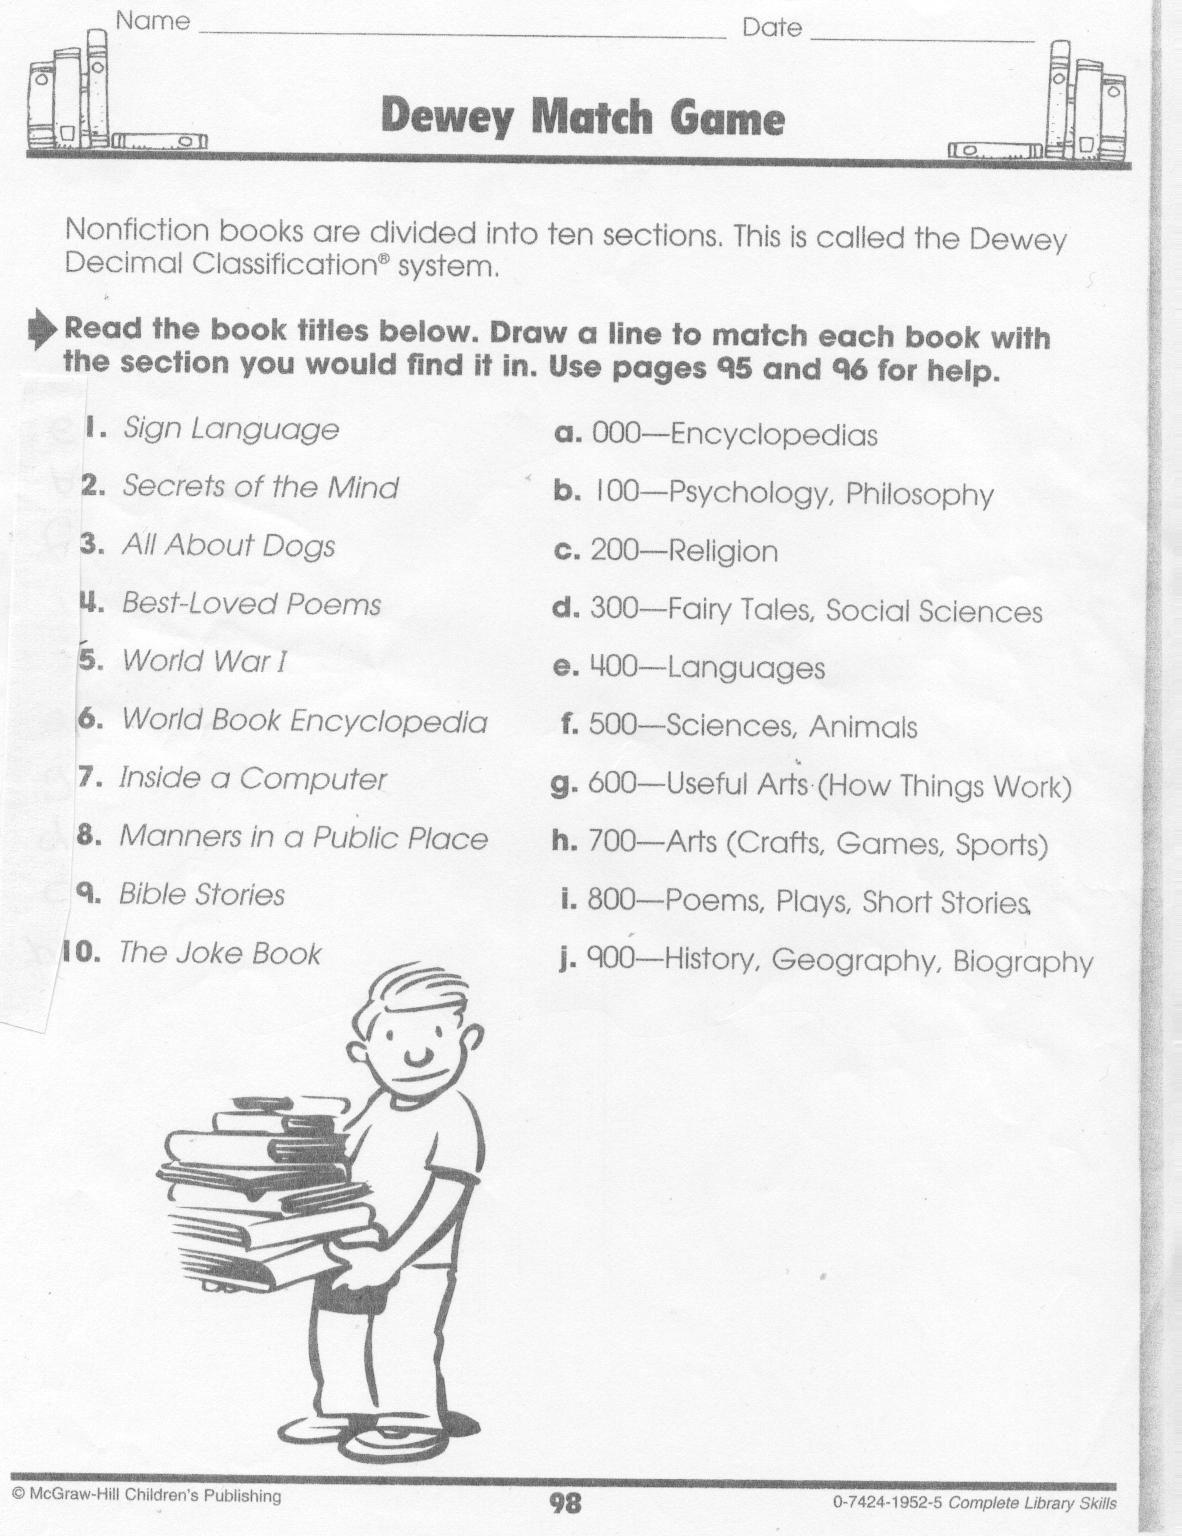 Dewey Decimal Cheat Sheet For Kids